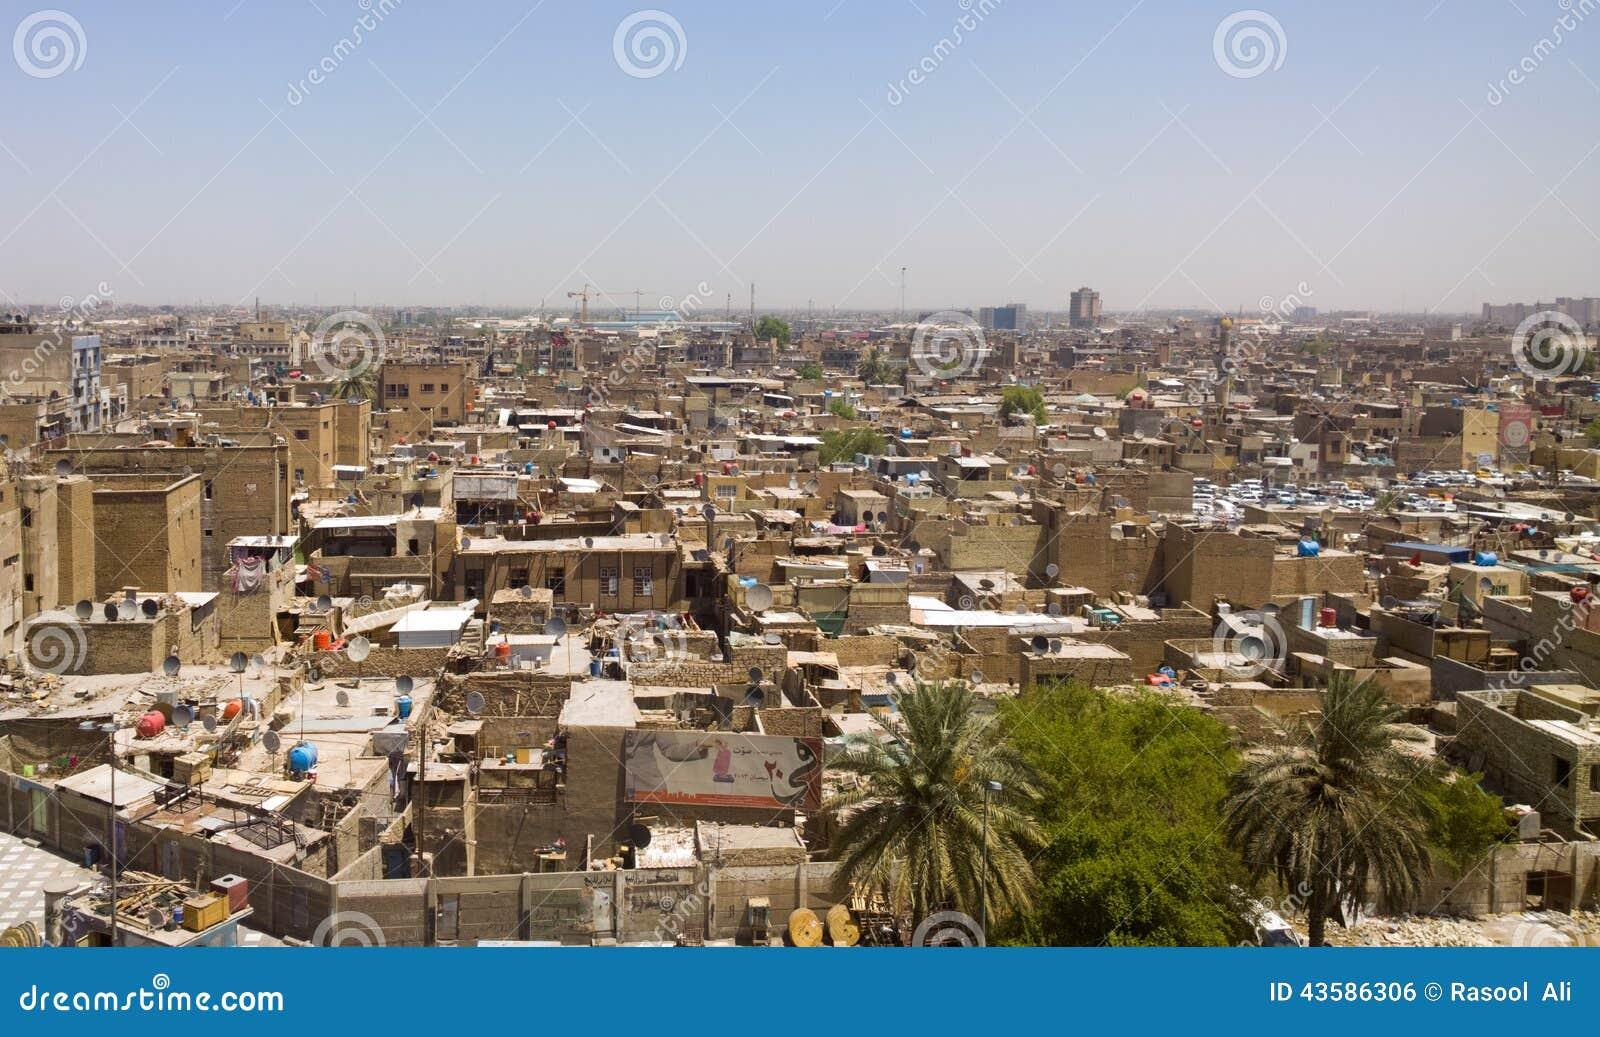 Baghdad stock photo  Image of july, iraq, tigris